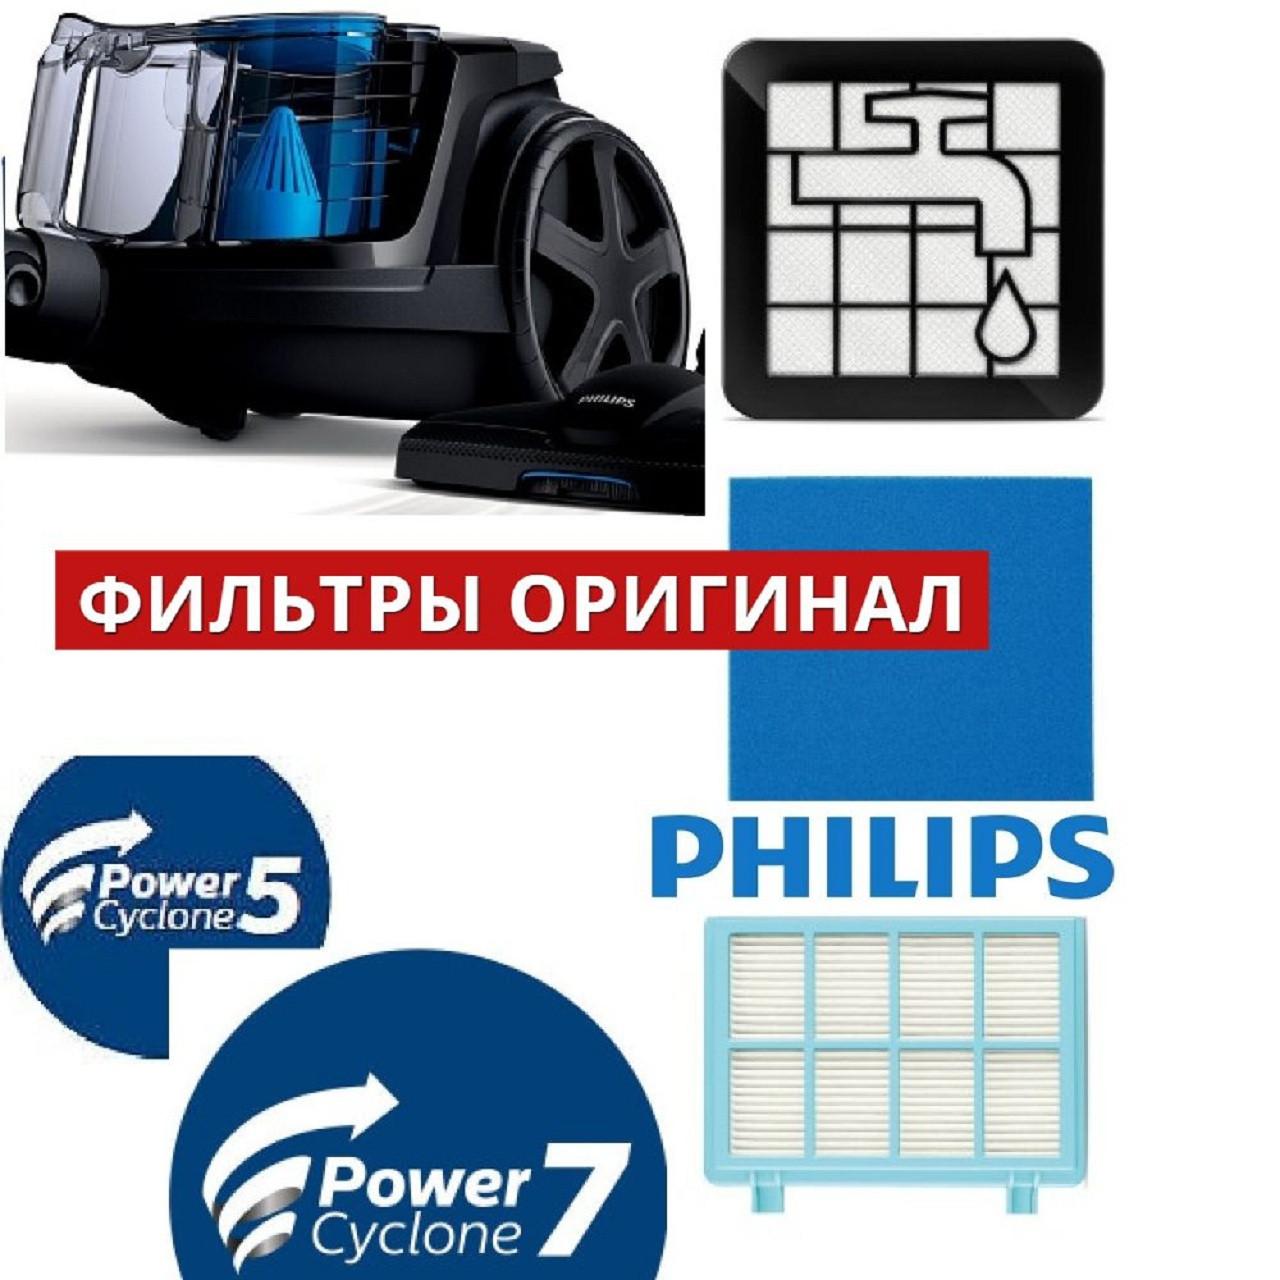 Philips fc9350-fc9353, fc9330-fc9334, fc9553-fc9573 набор фильтров FC8010 01 02 на безмешковый пылесос с/у